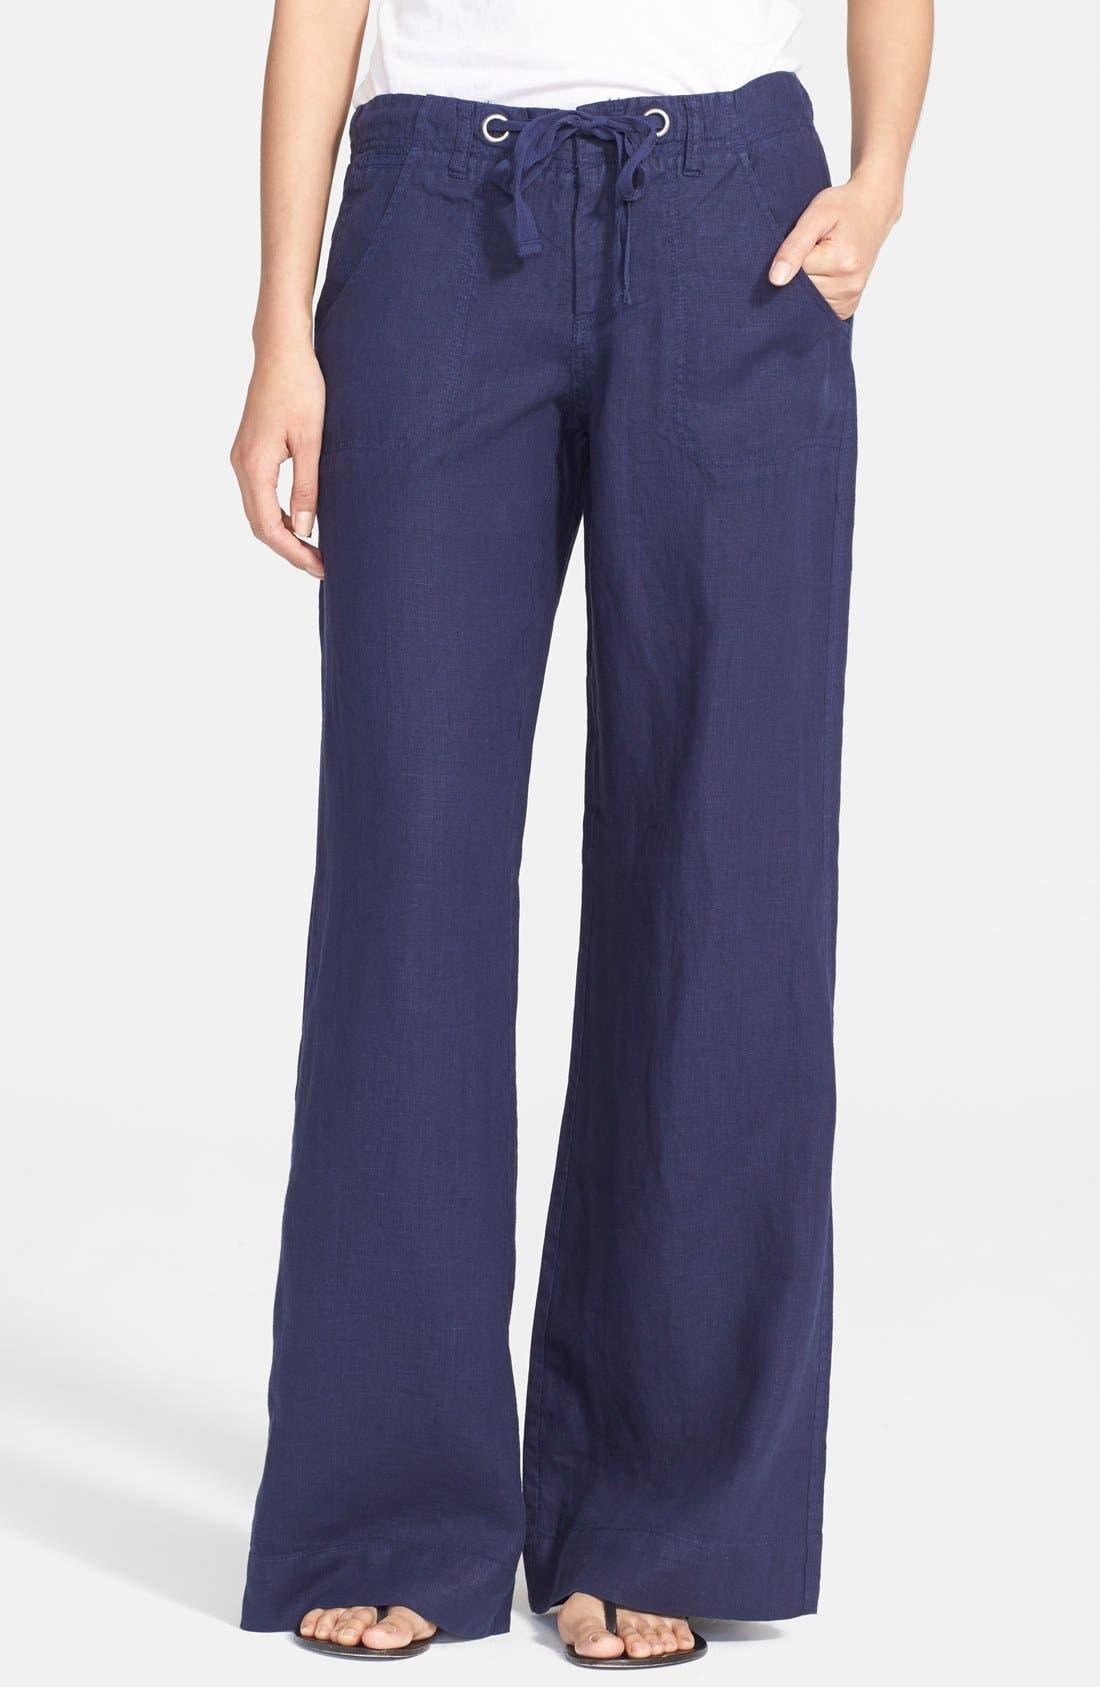 Joie Wide Leg Linen Pants